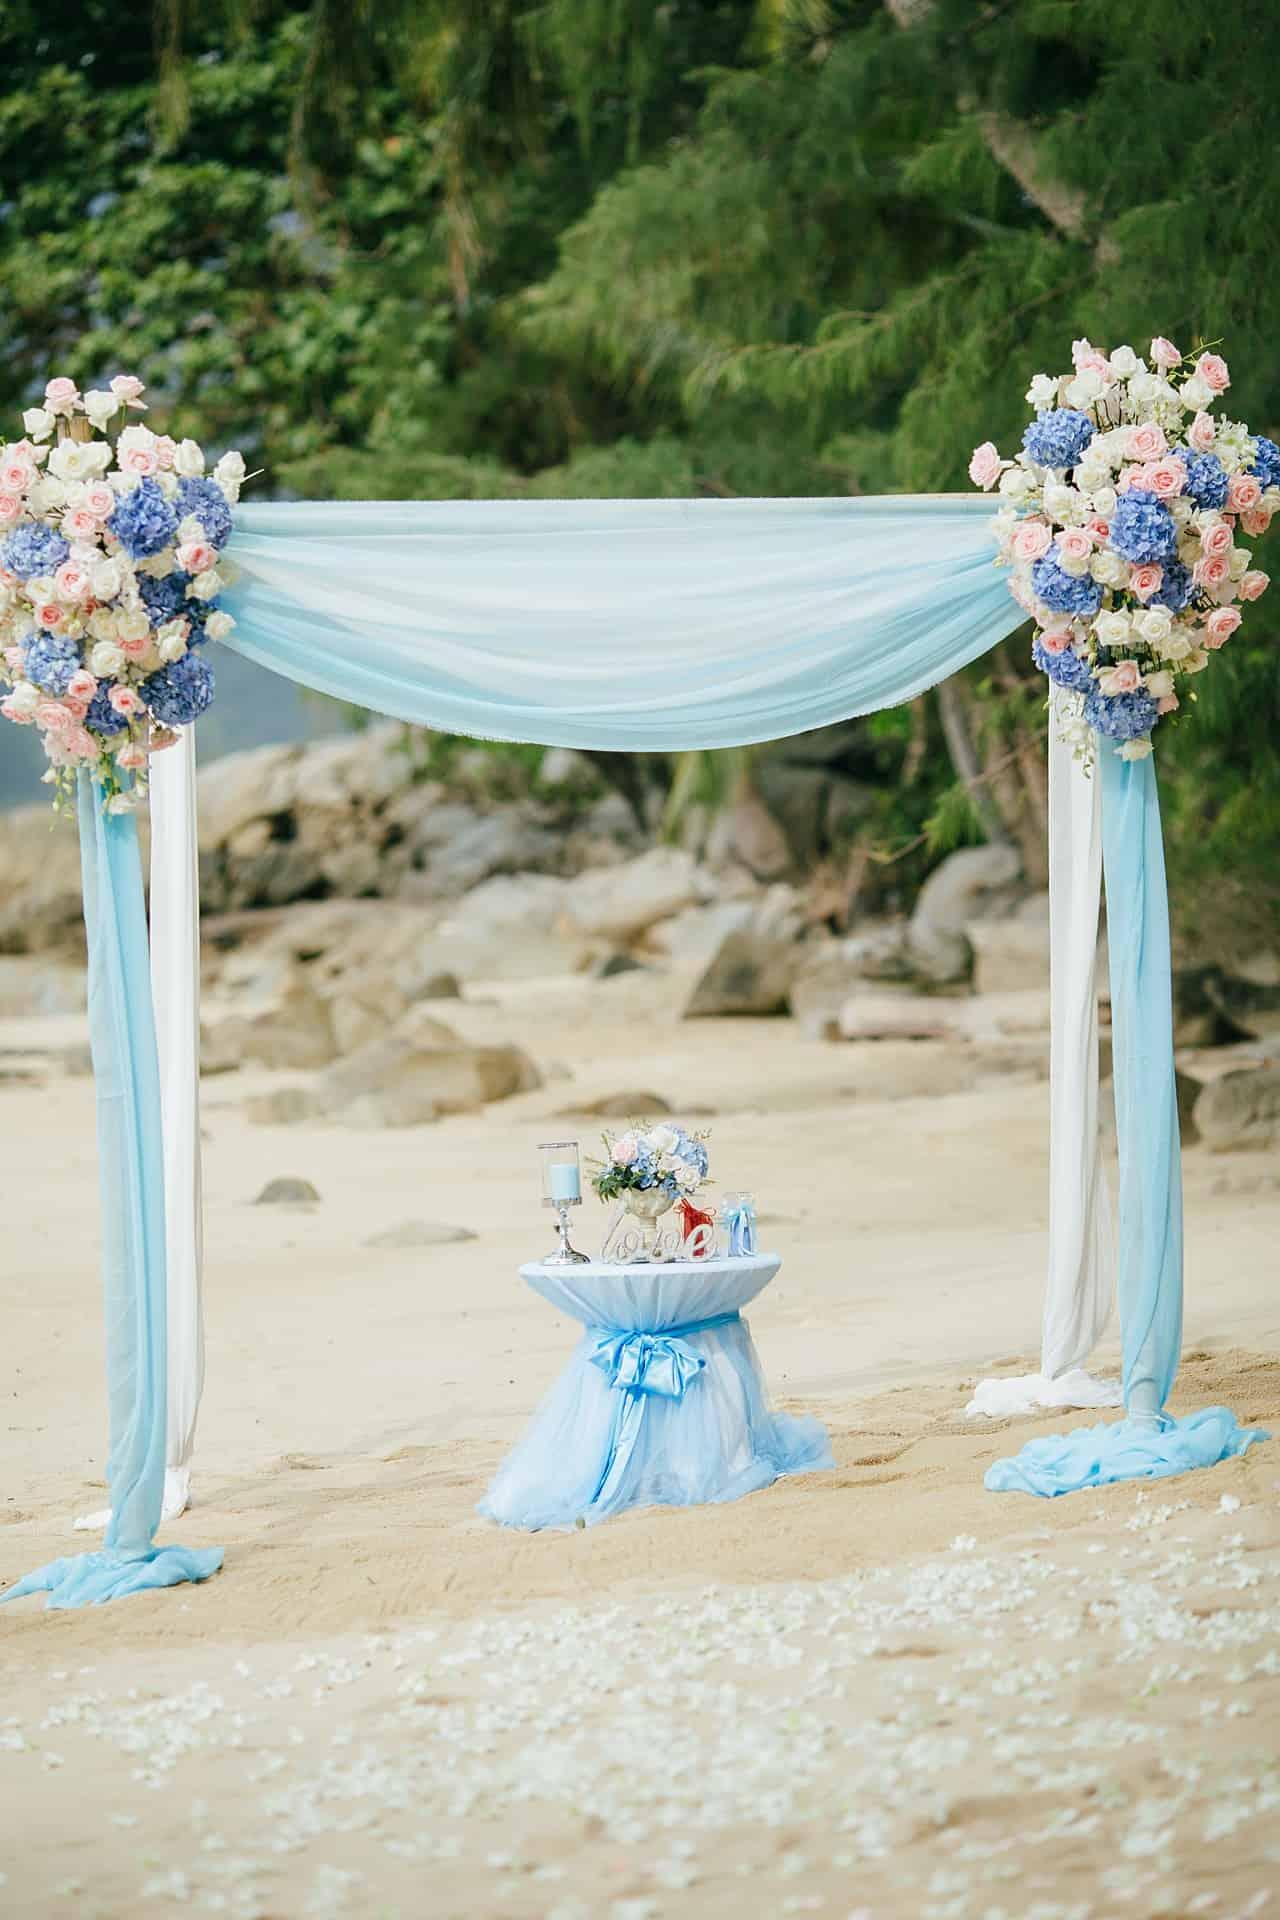 Wedding Haruka & Ronny, Hua Beach 8th September 2018 226